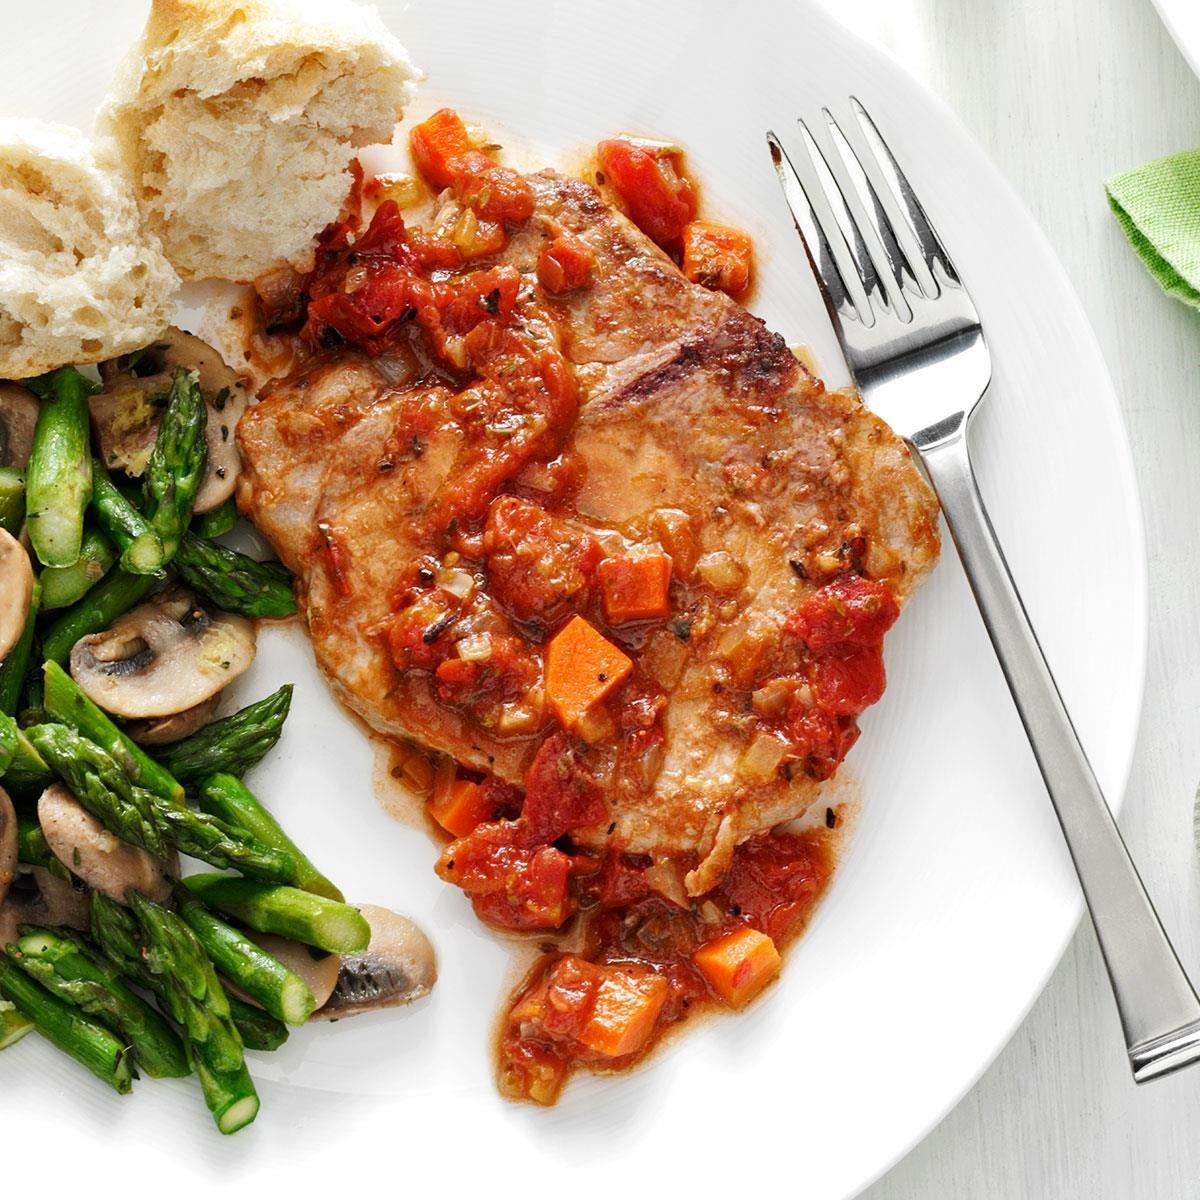 Tomato-Topped Italian Pork Chops Recipe